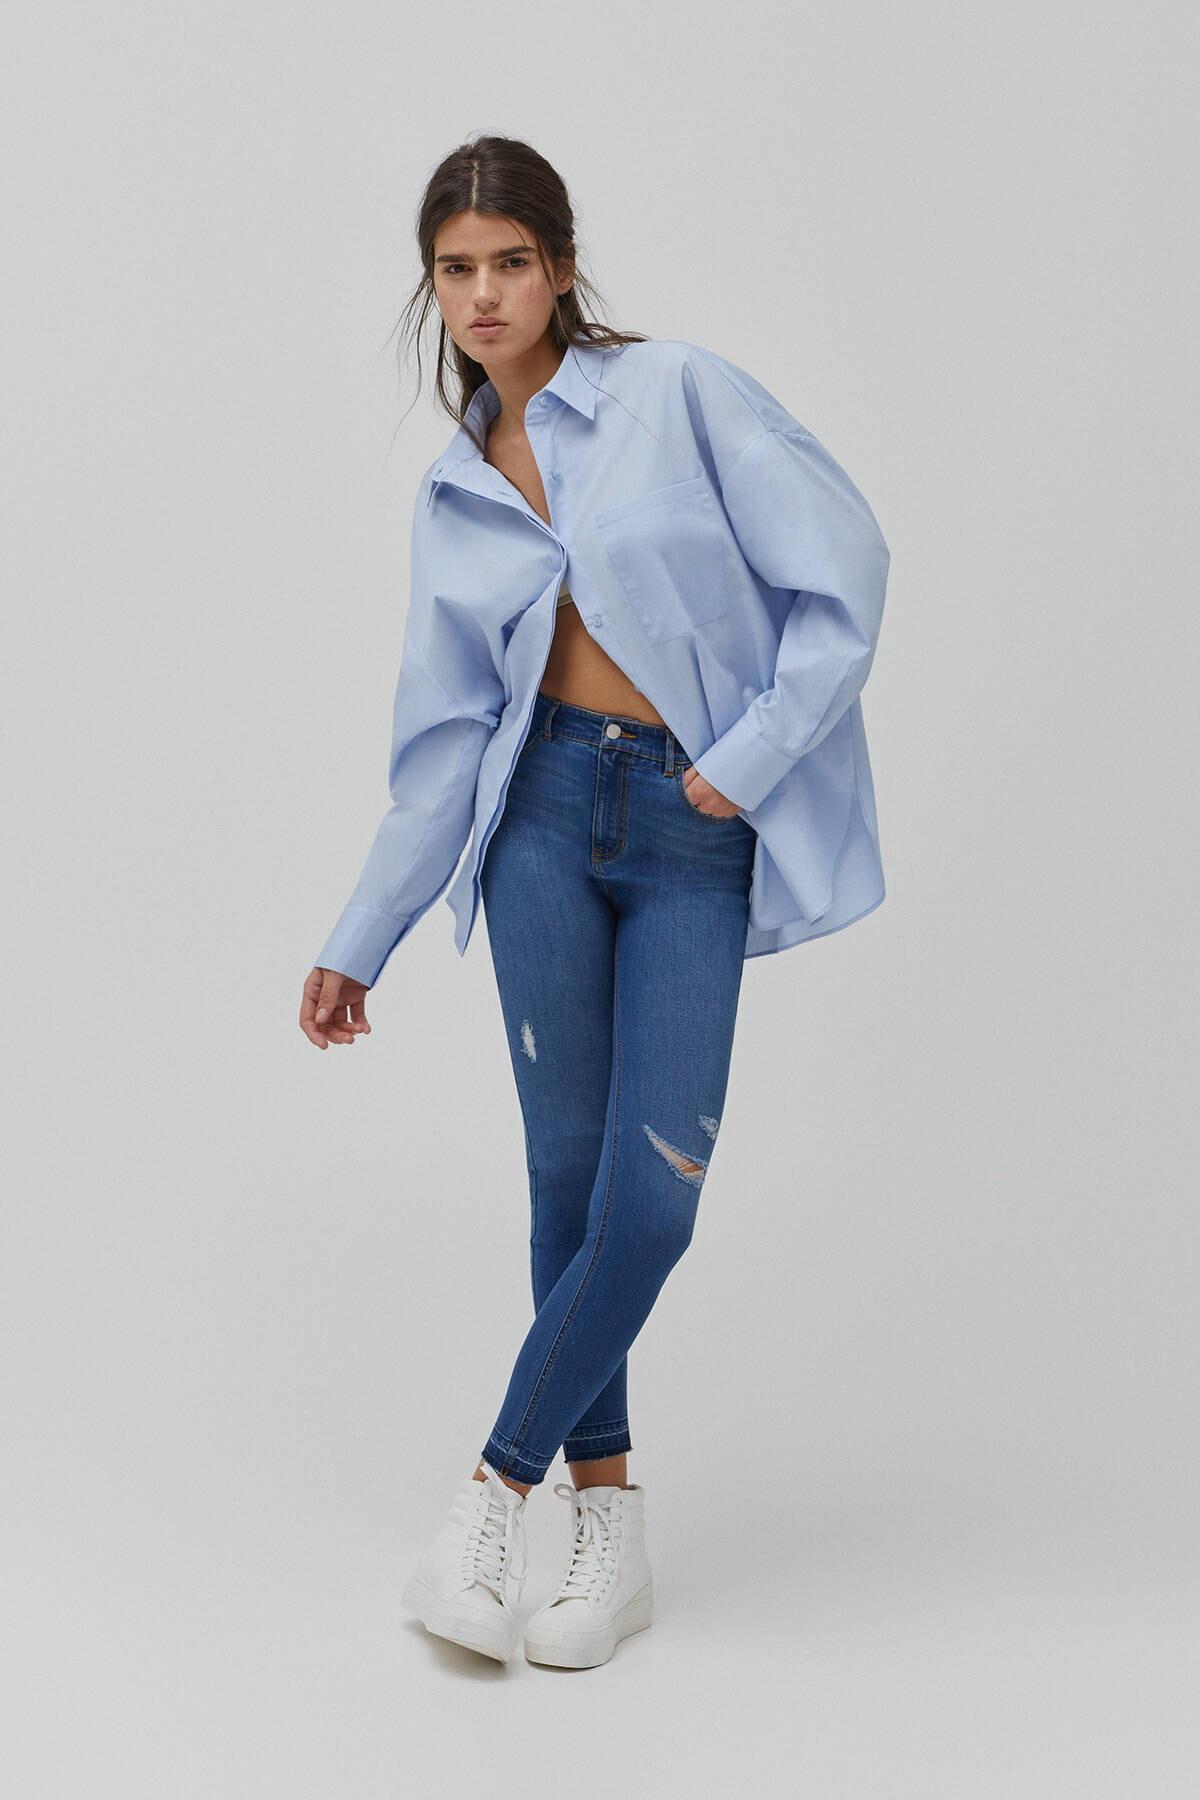 Pull & Bear Kadın  Mürekkep Mavisi Yüksek Bel Skinny Fit Kapri Jean 09689301 1